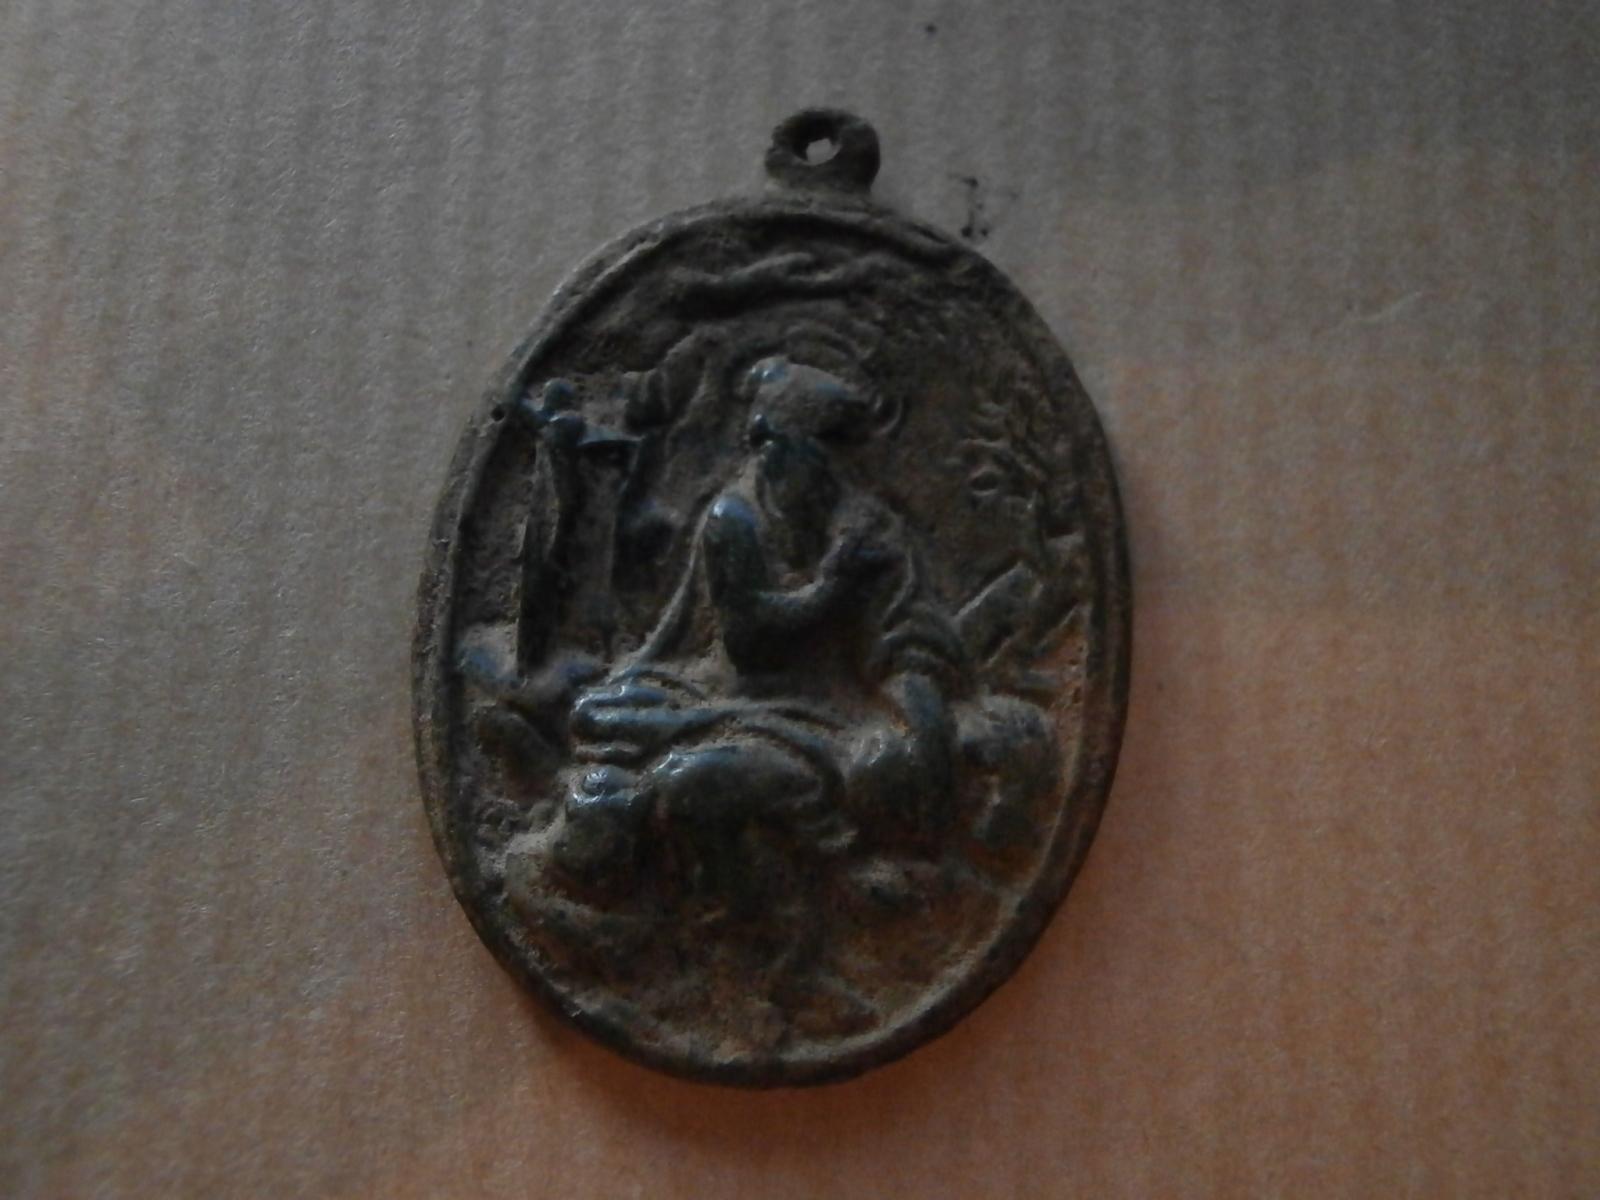 Medalla Virgen de Guadalupe / San Jerónimo de Estridon S-XVII pre-Toisón 2jxp4m